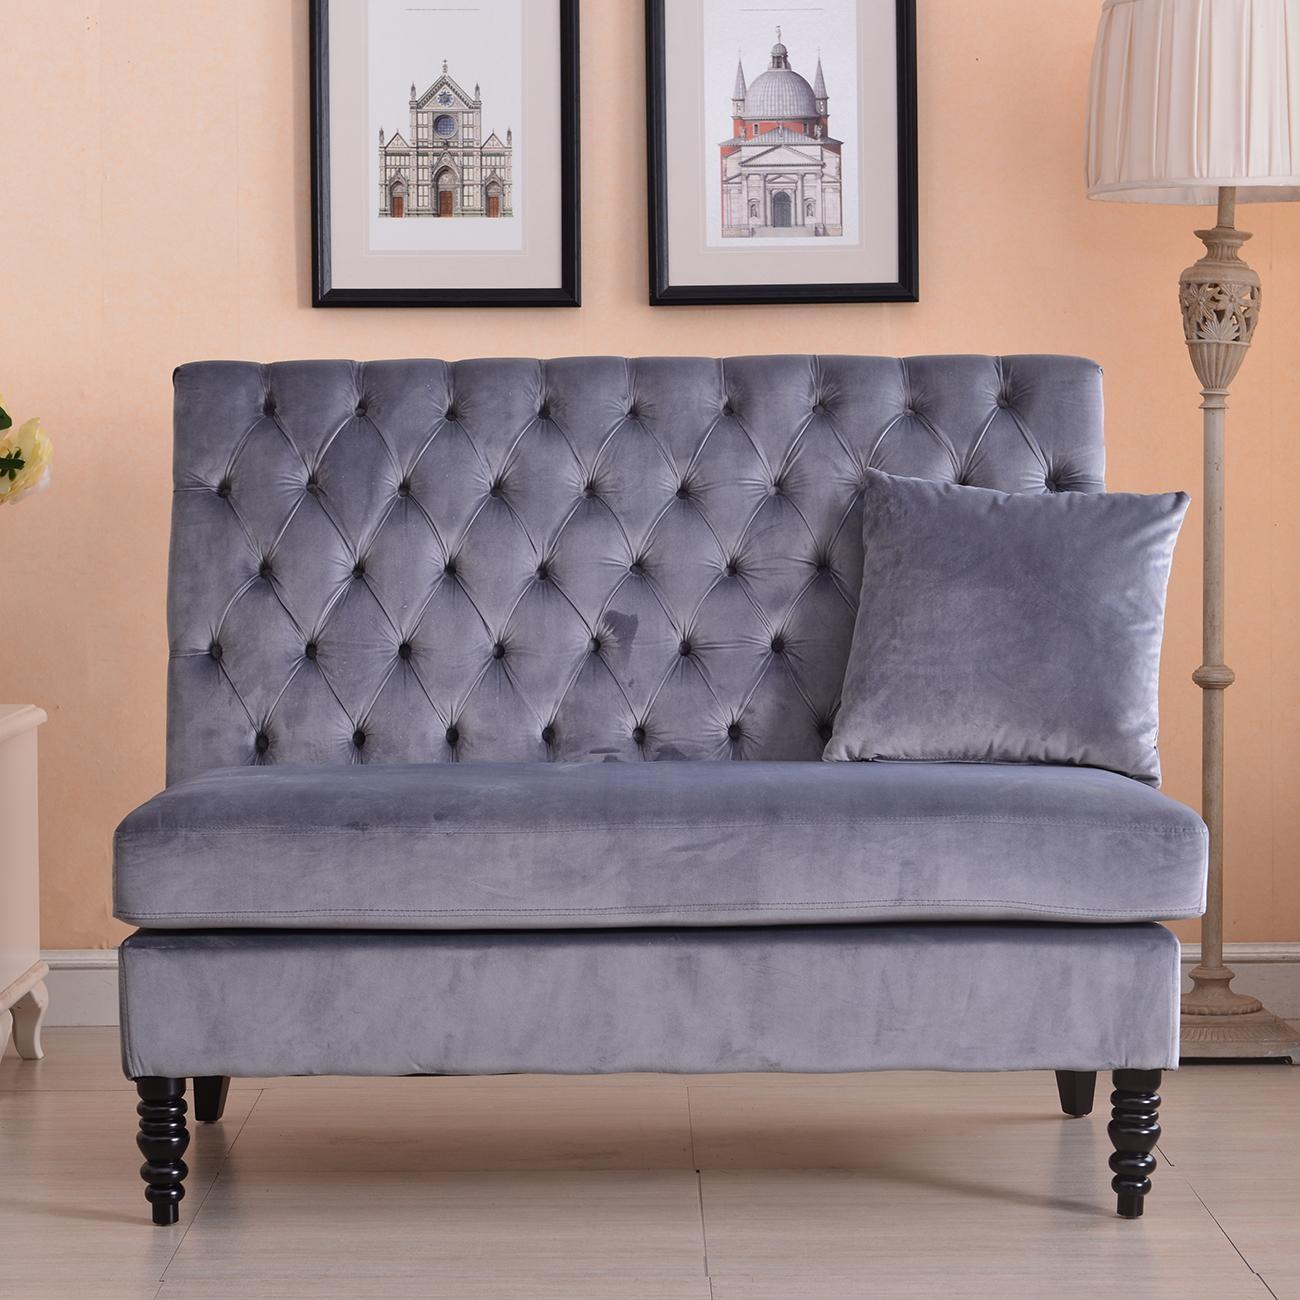 bedroom sofa nice sofas 20 photos bench ideas